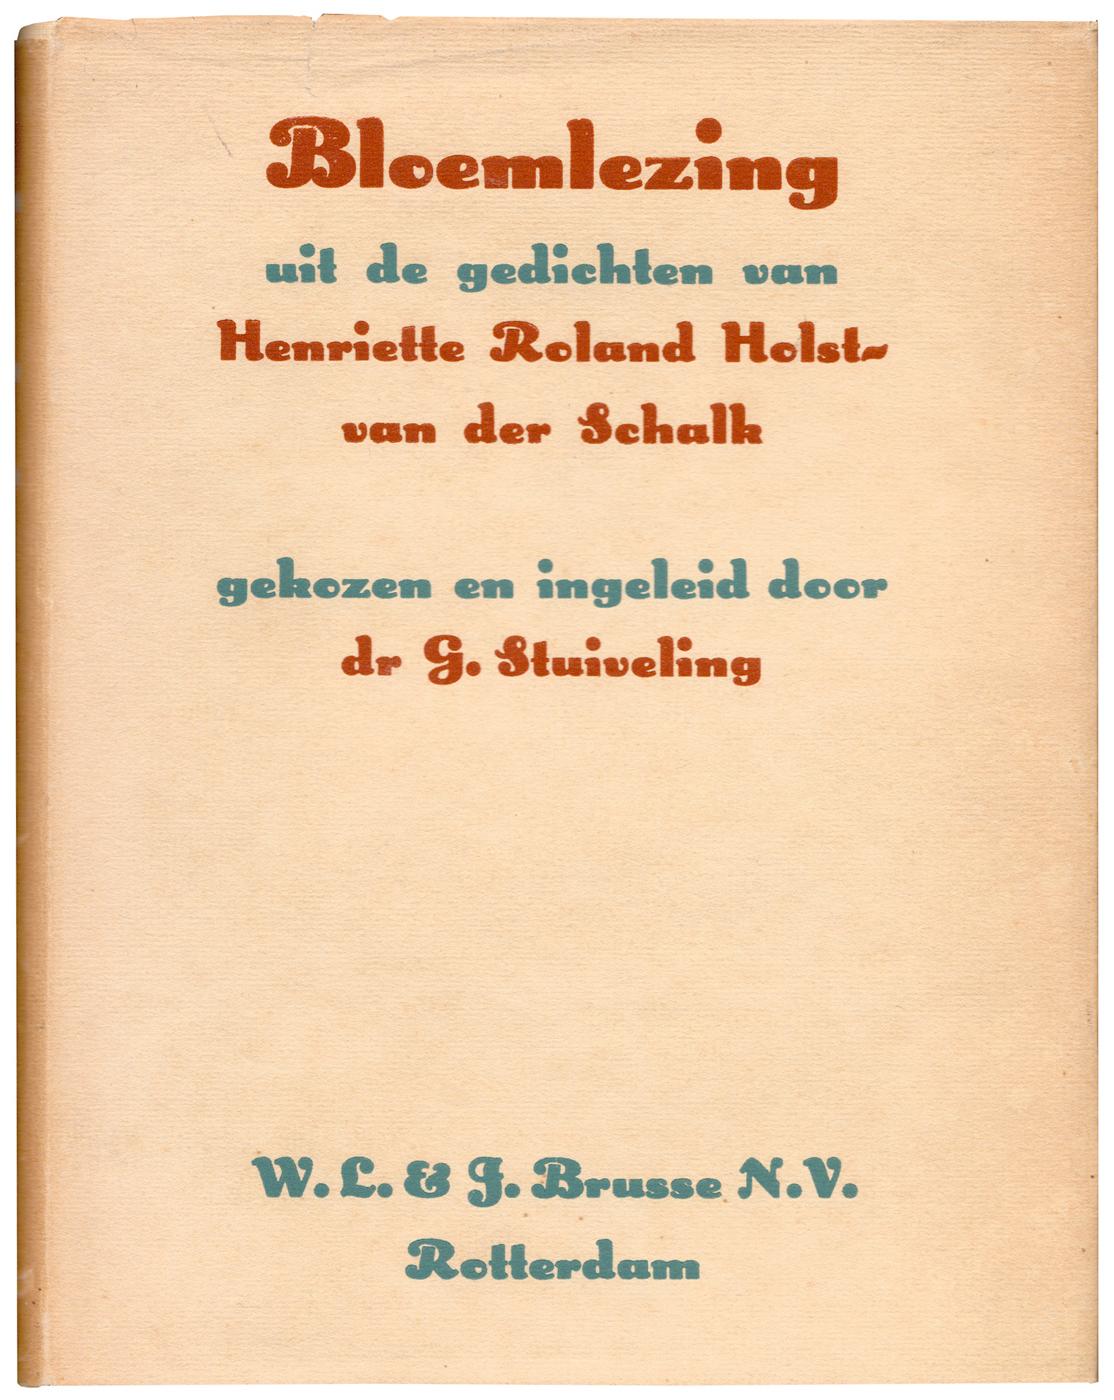 Bloemlezing By Henriette Roland Holst Van Der Schalk Fonts